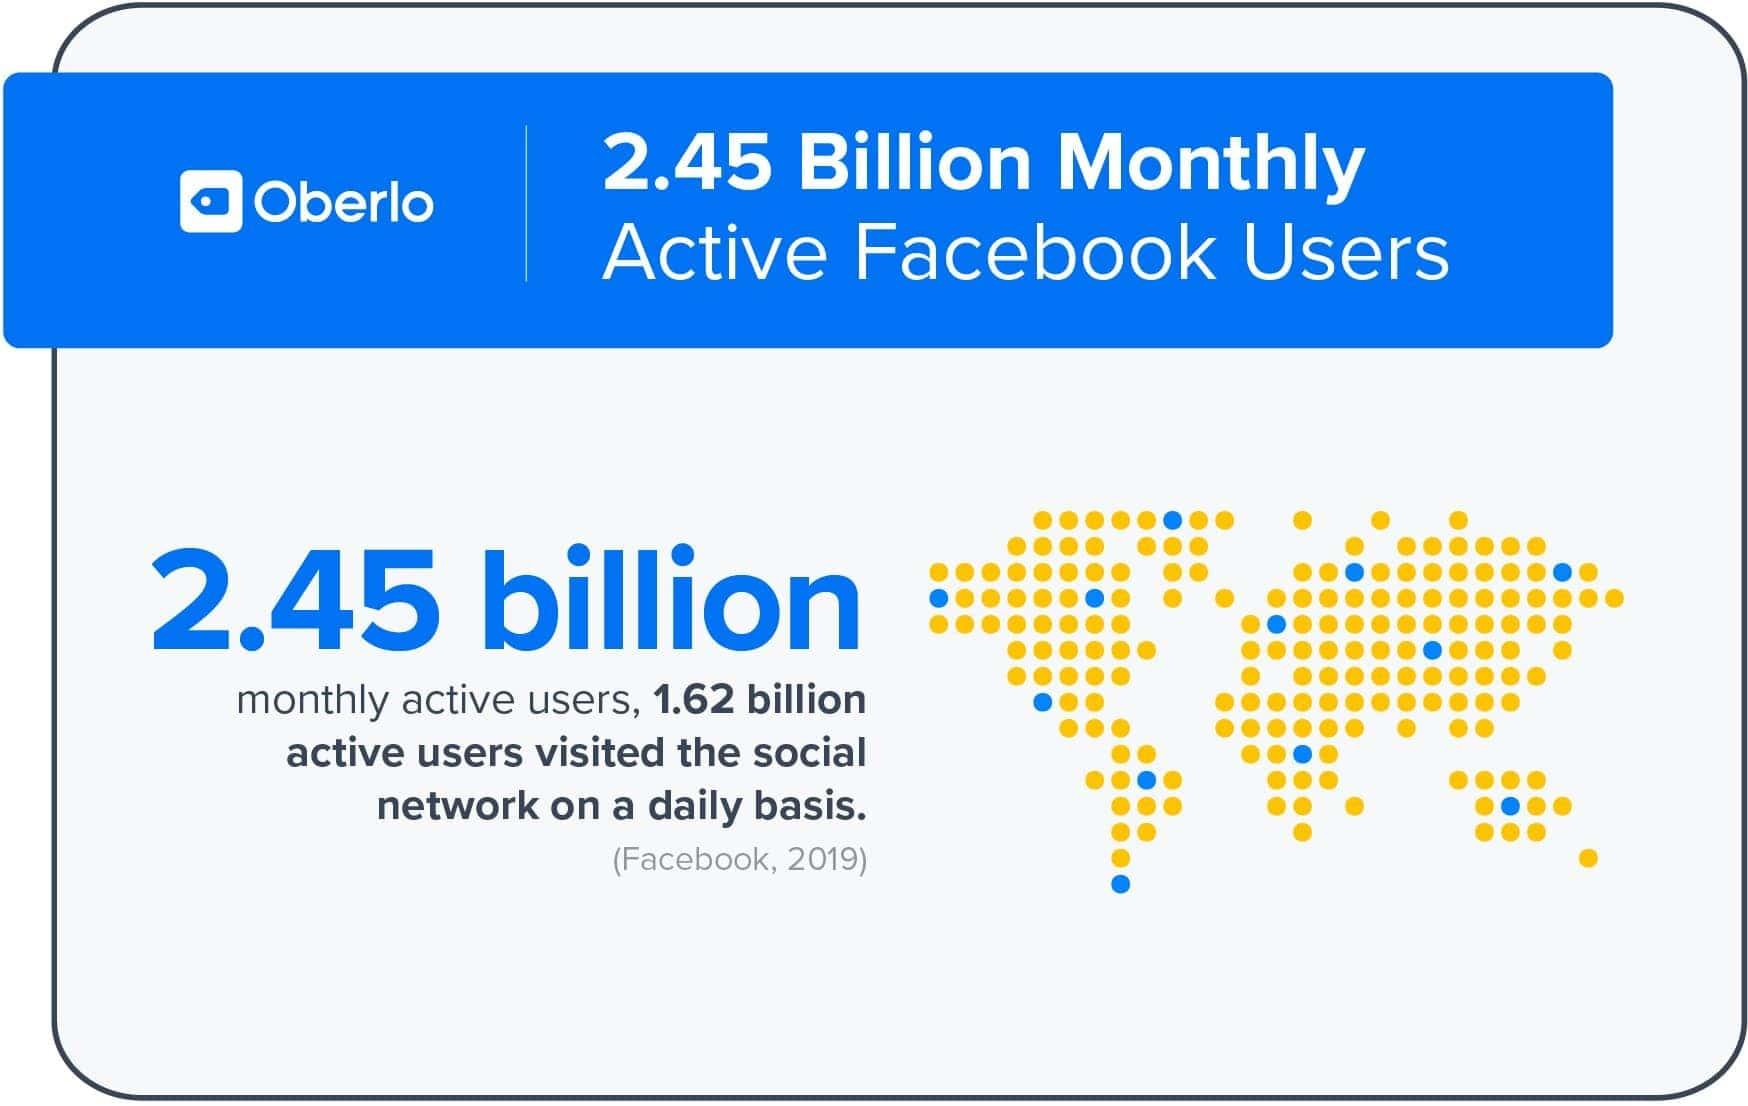 Facebook-statistics-02-1-min-1